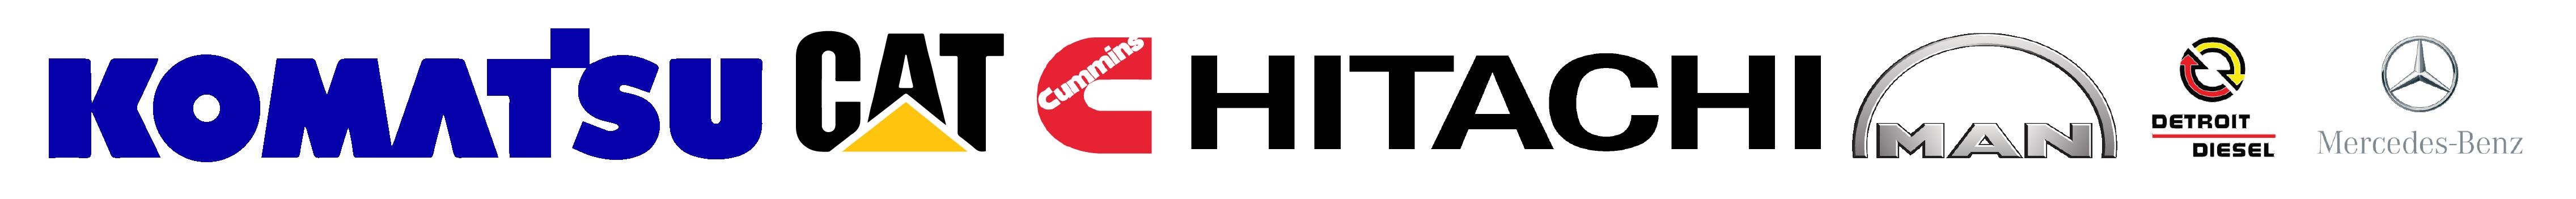 MASTER WEBSITE logosai-02